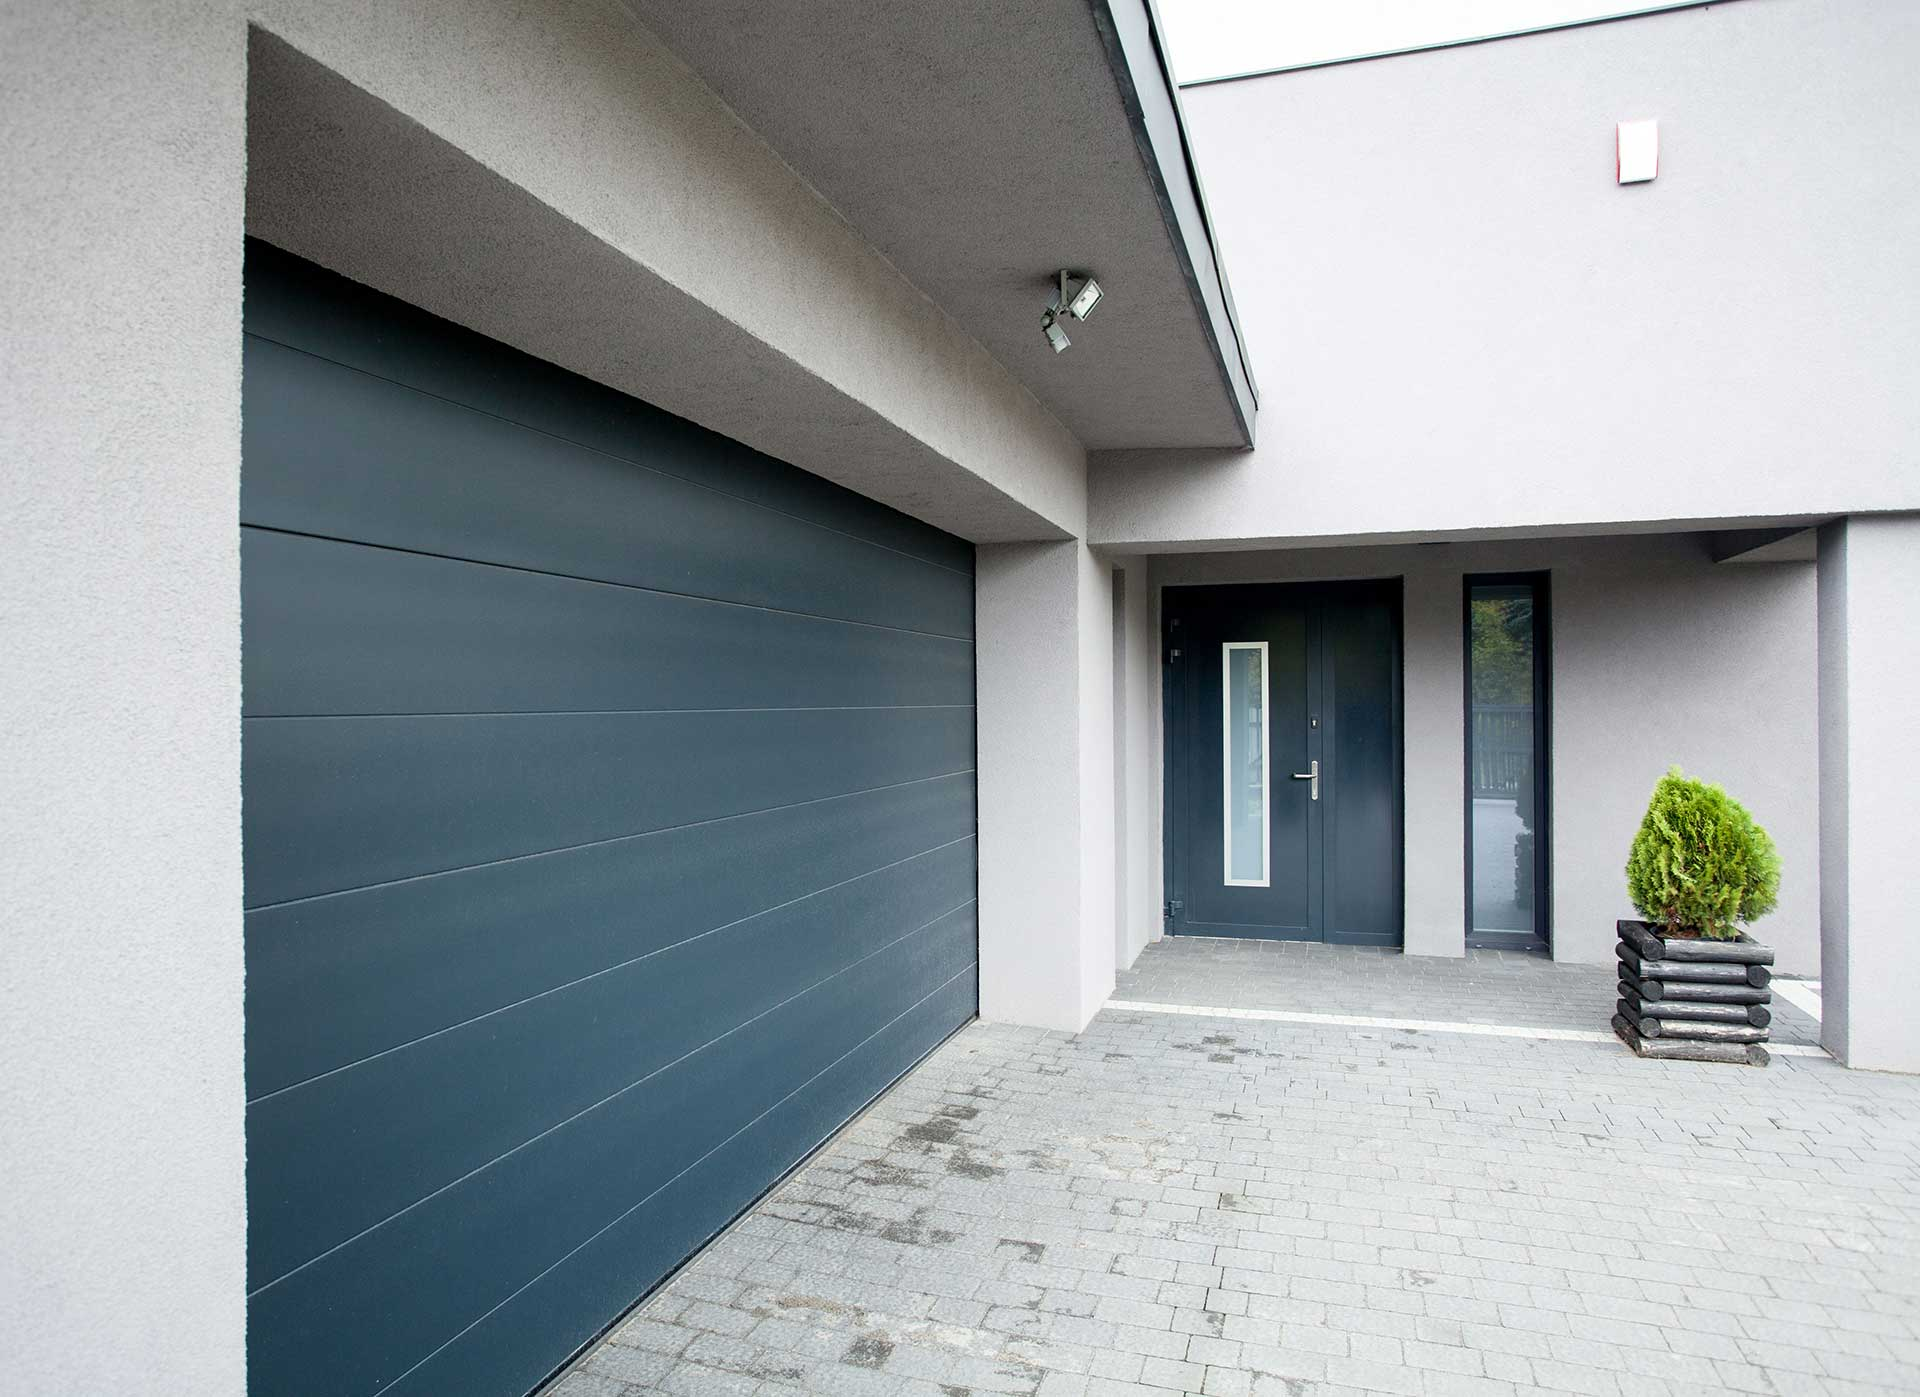 Cotswold Garage Doors Design and Installation